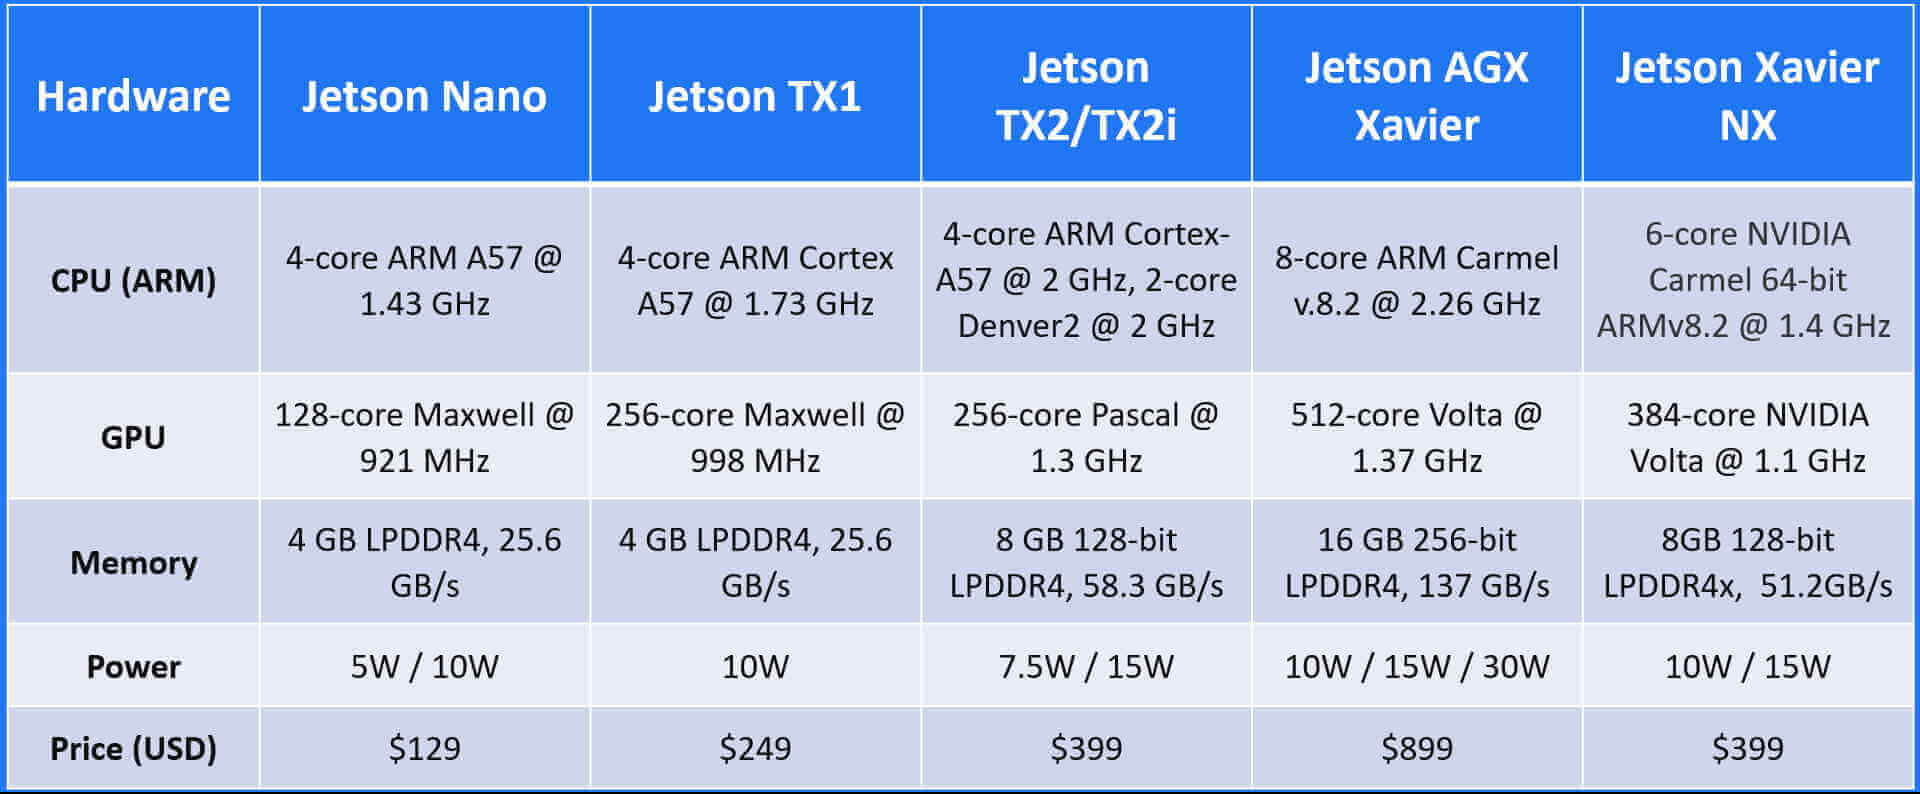 ALPR for Jetson Nano TX1 TX2 Xavier